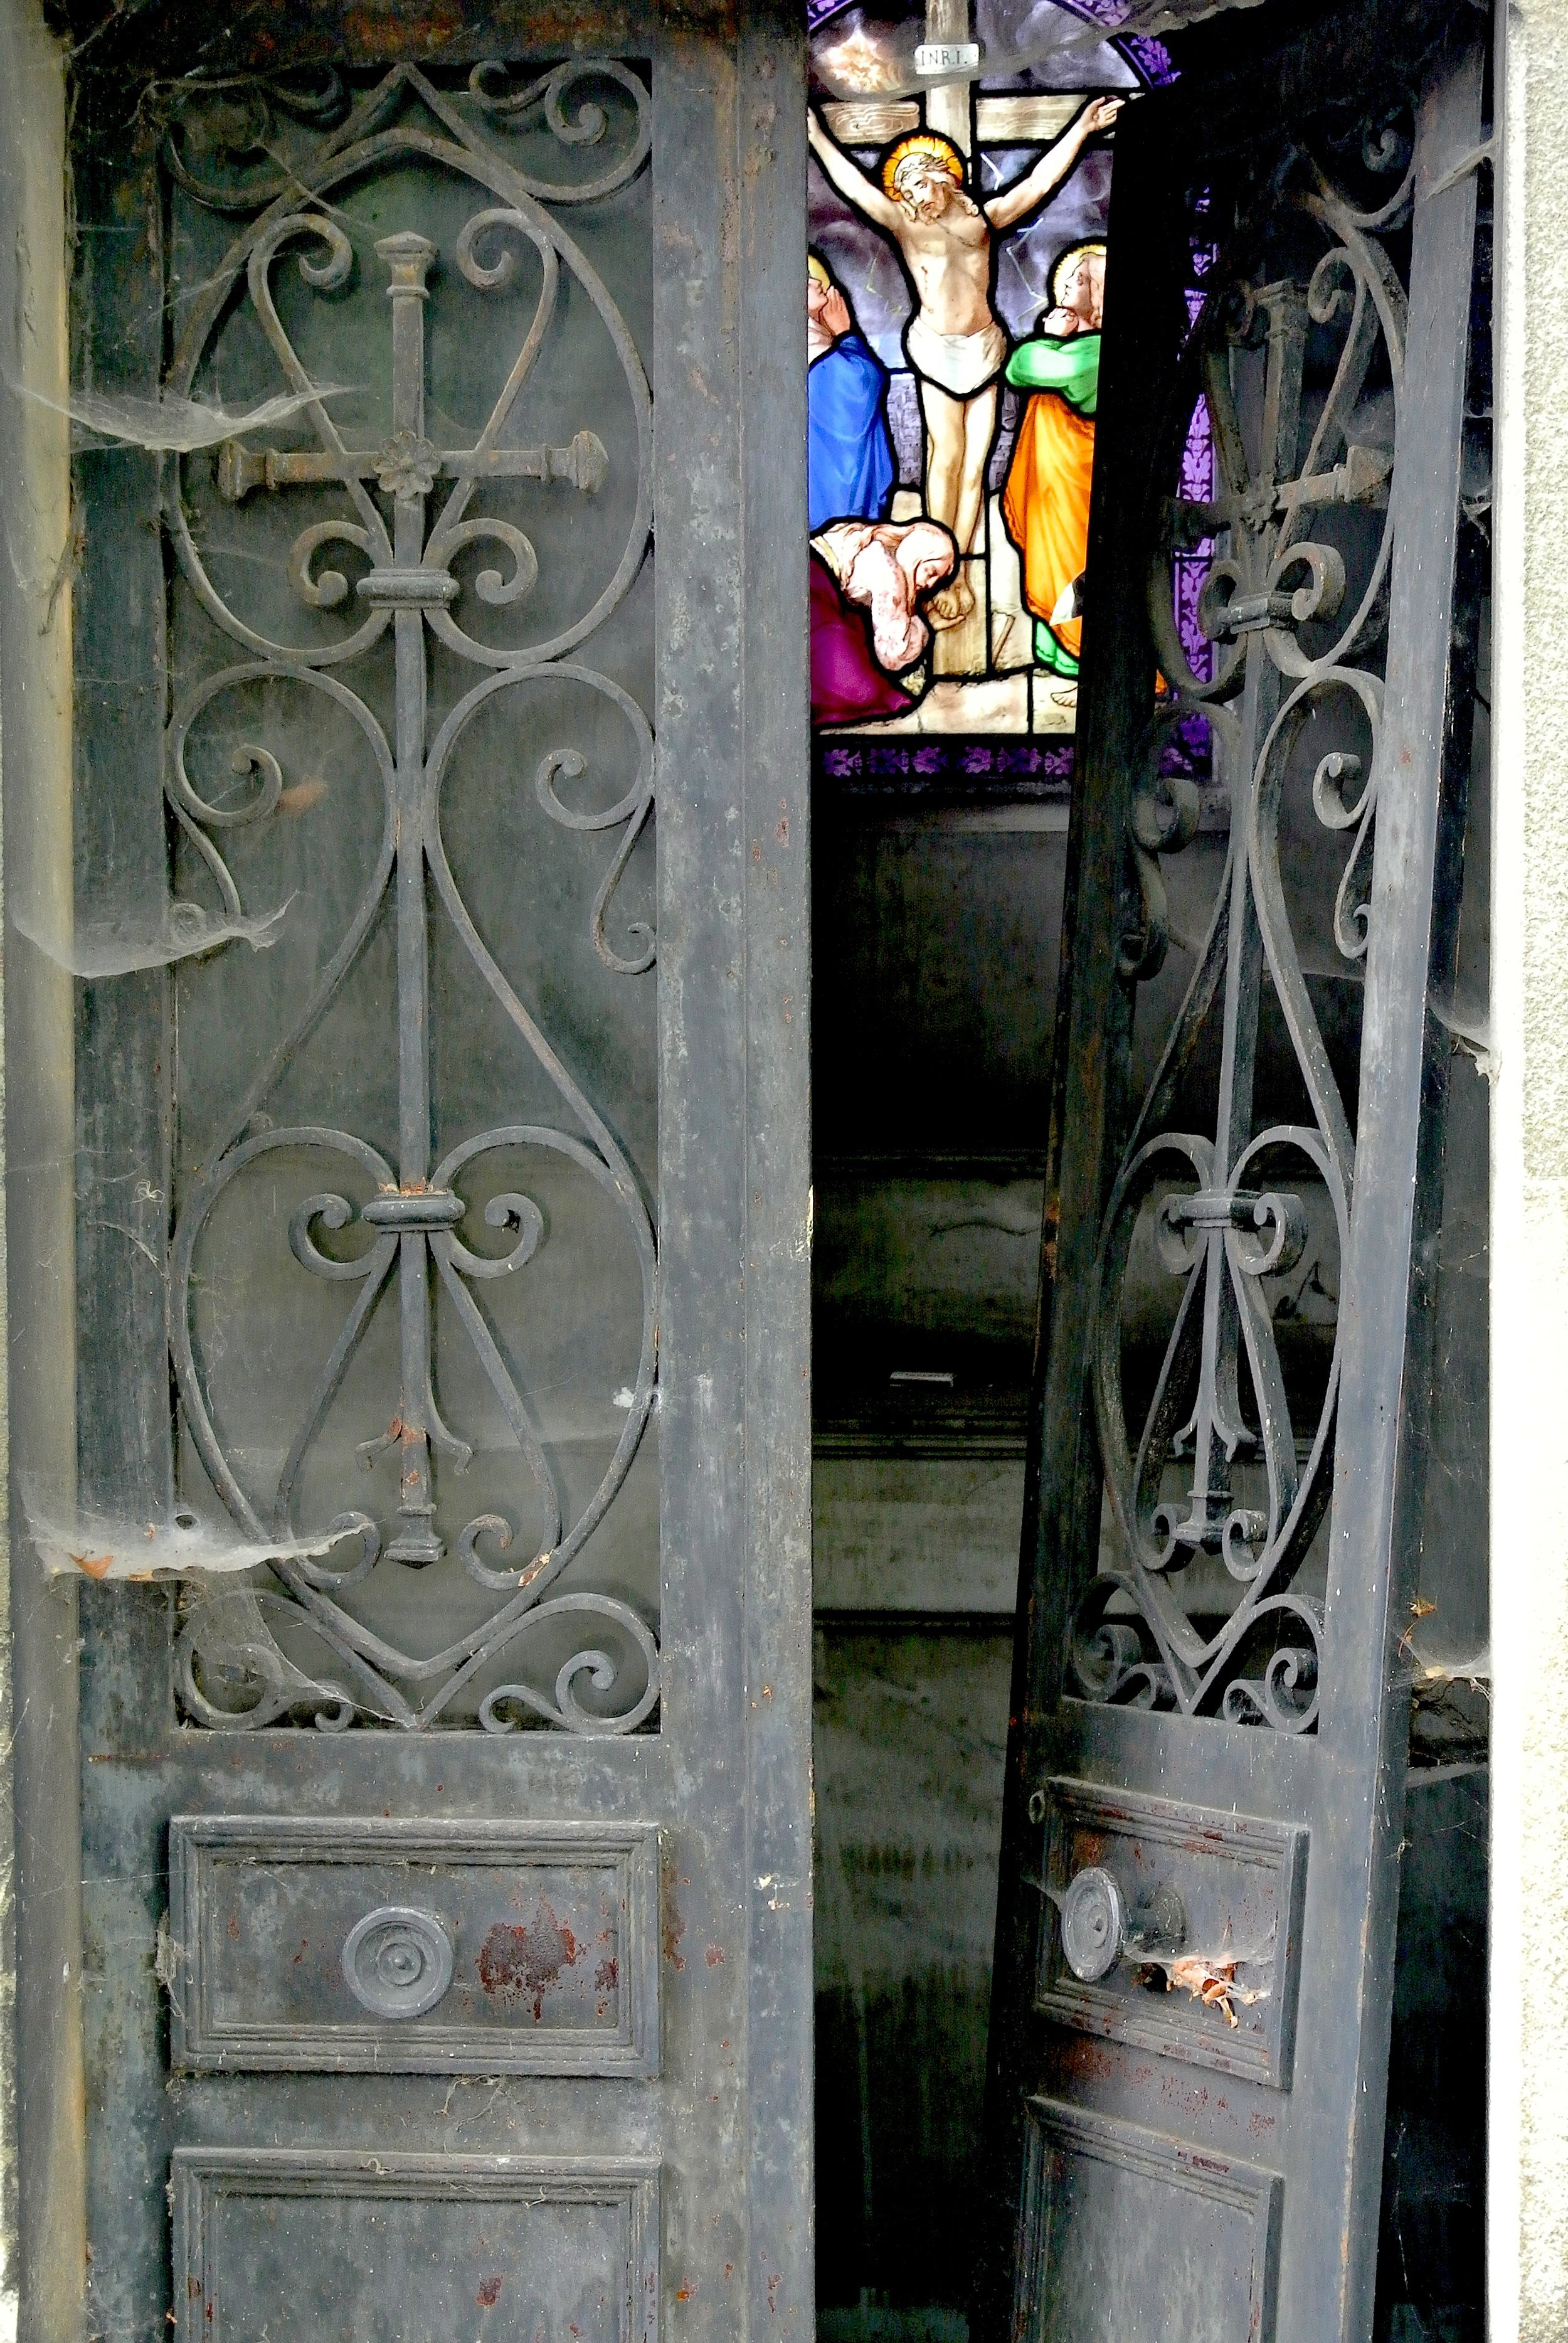 stainedglassgrave.JPG